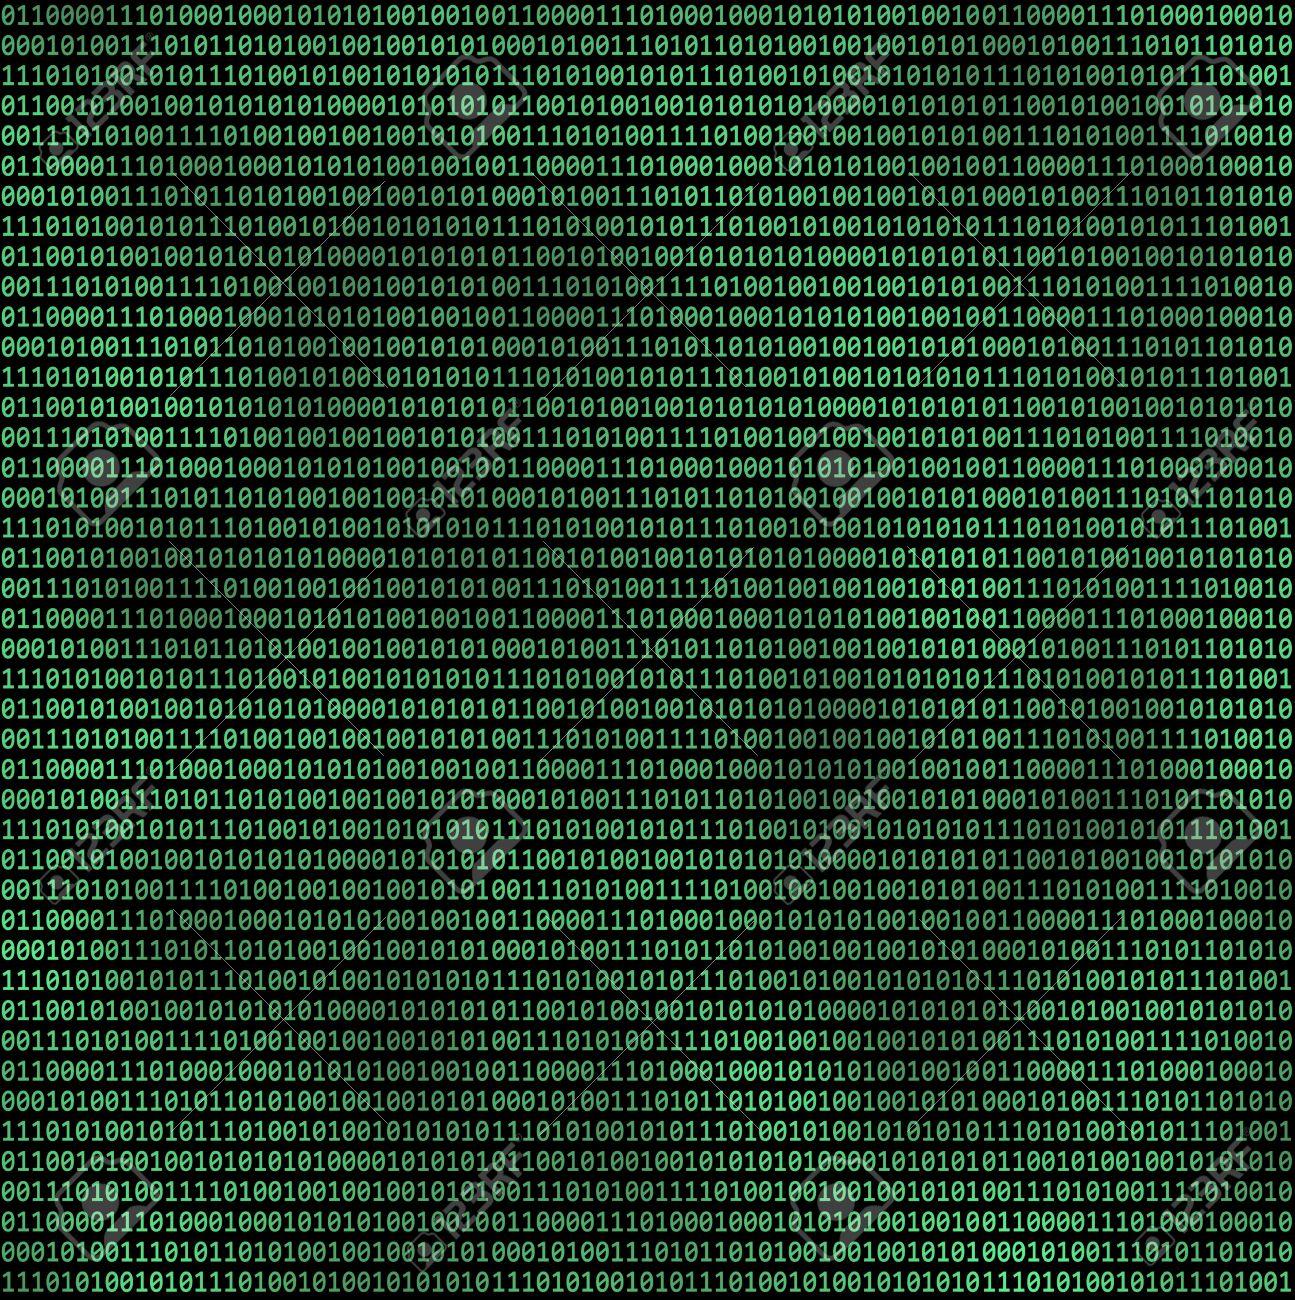 Binary computer code - 24540470